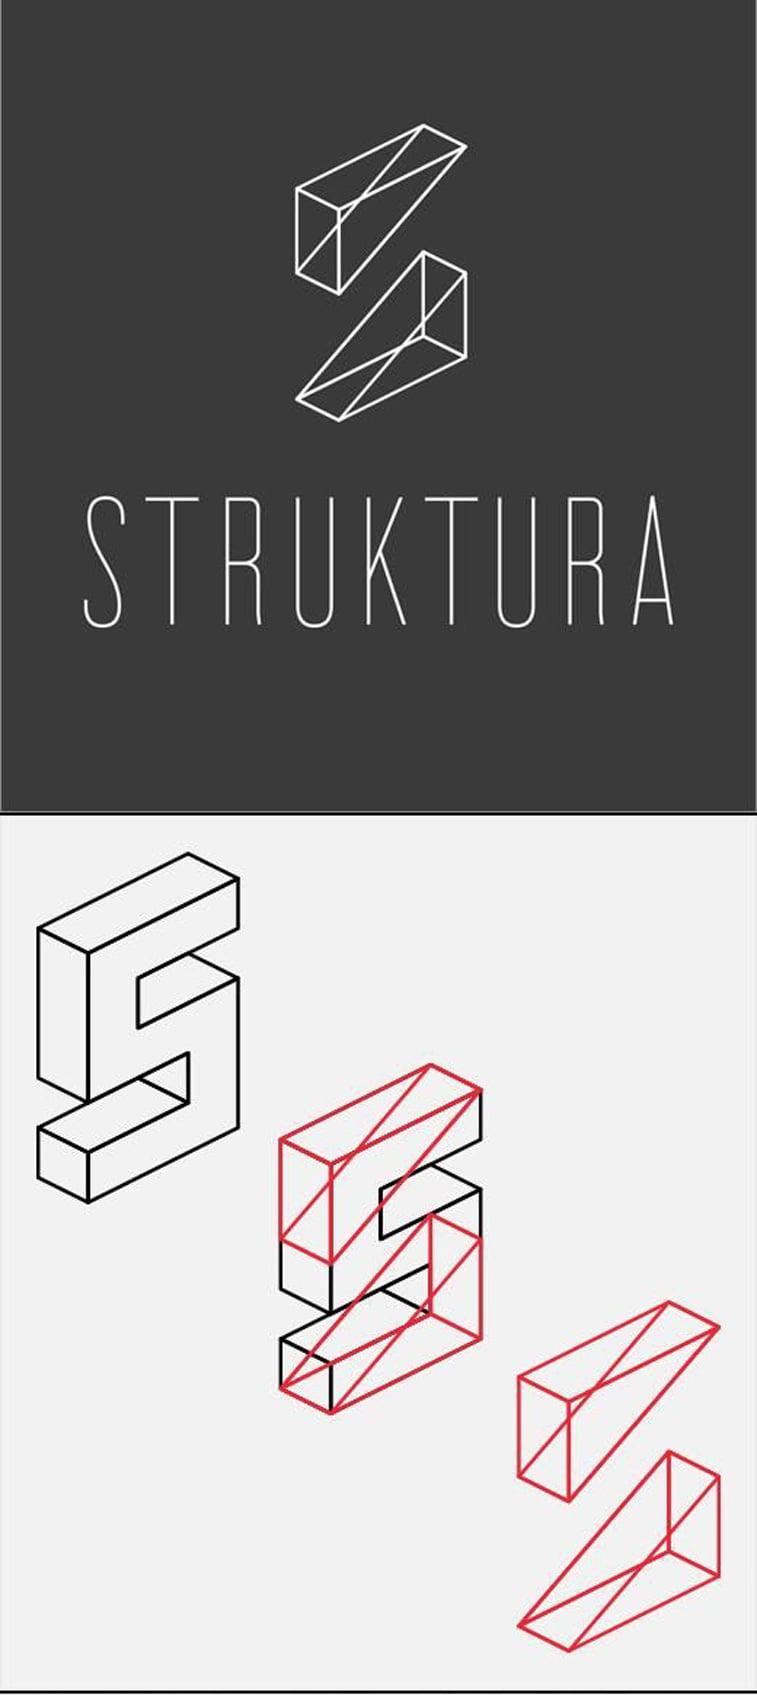 Structura identity pinterest